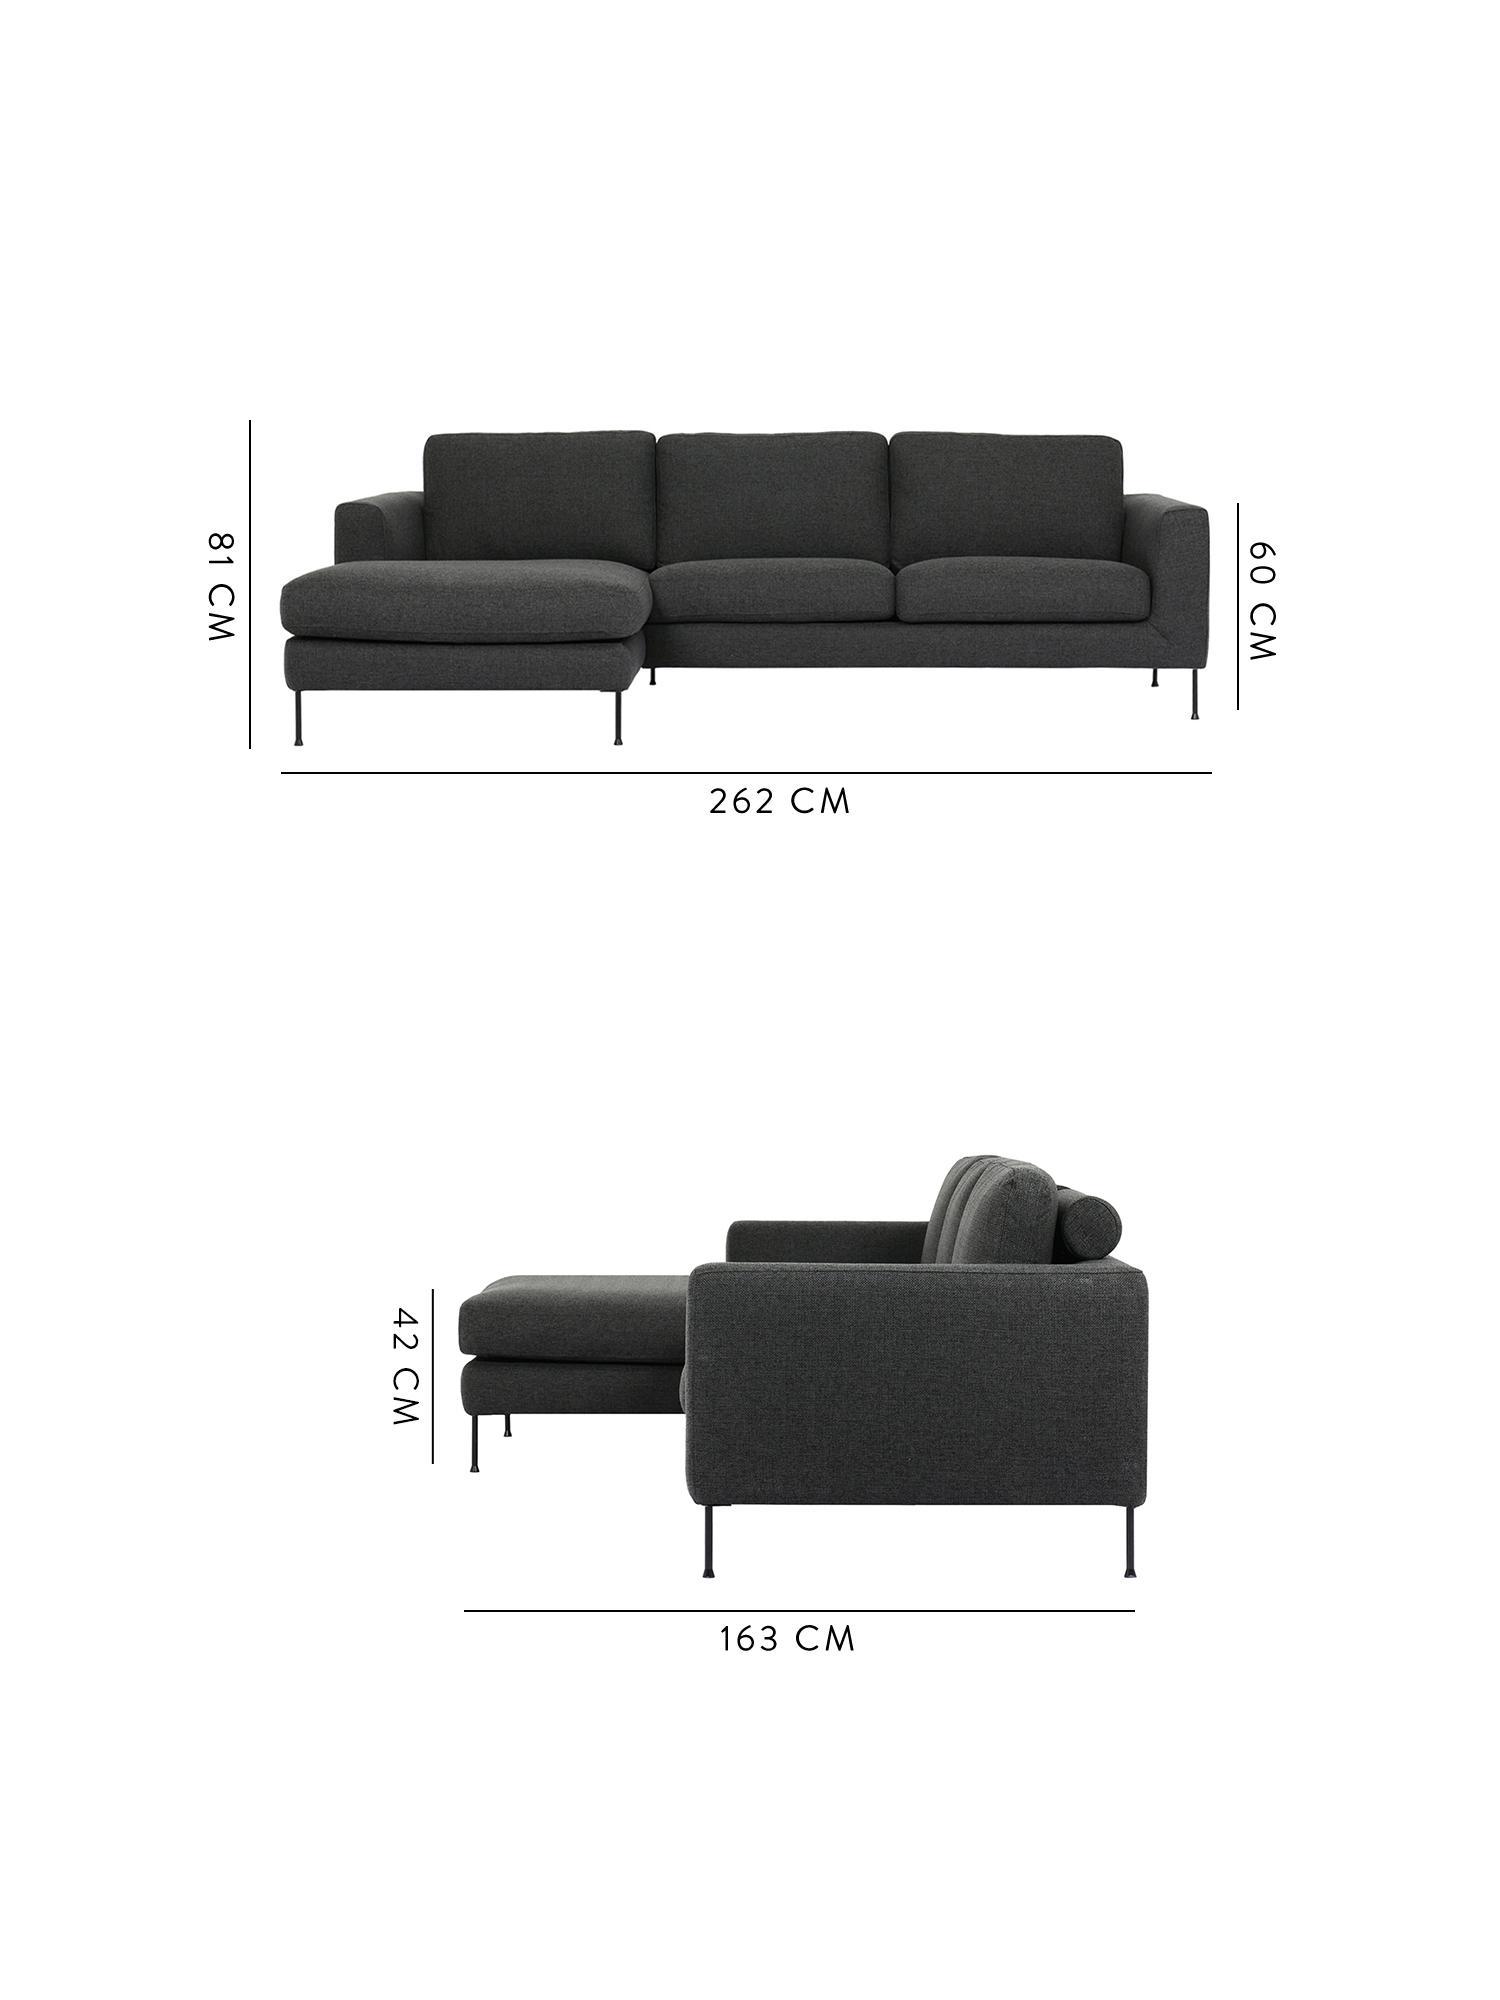 Canapé d'angle 3 places Cucita, Tissu anthracite